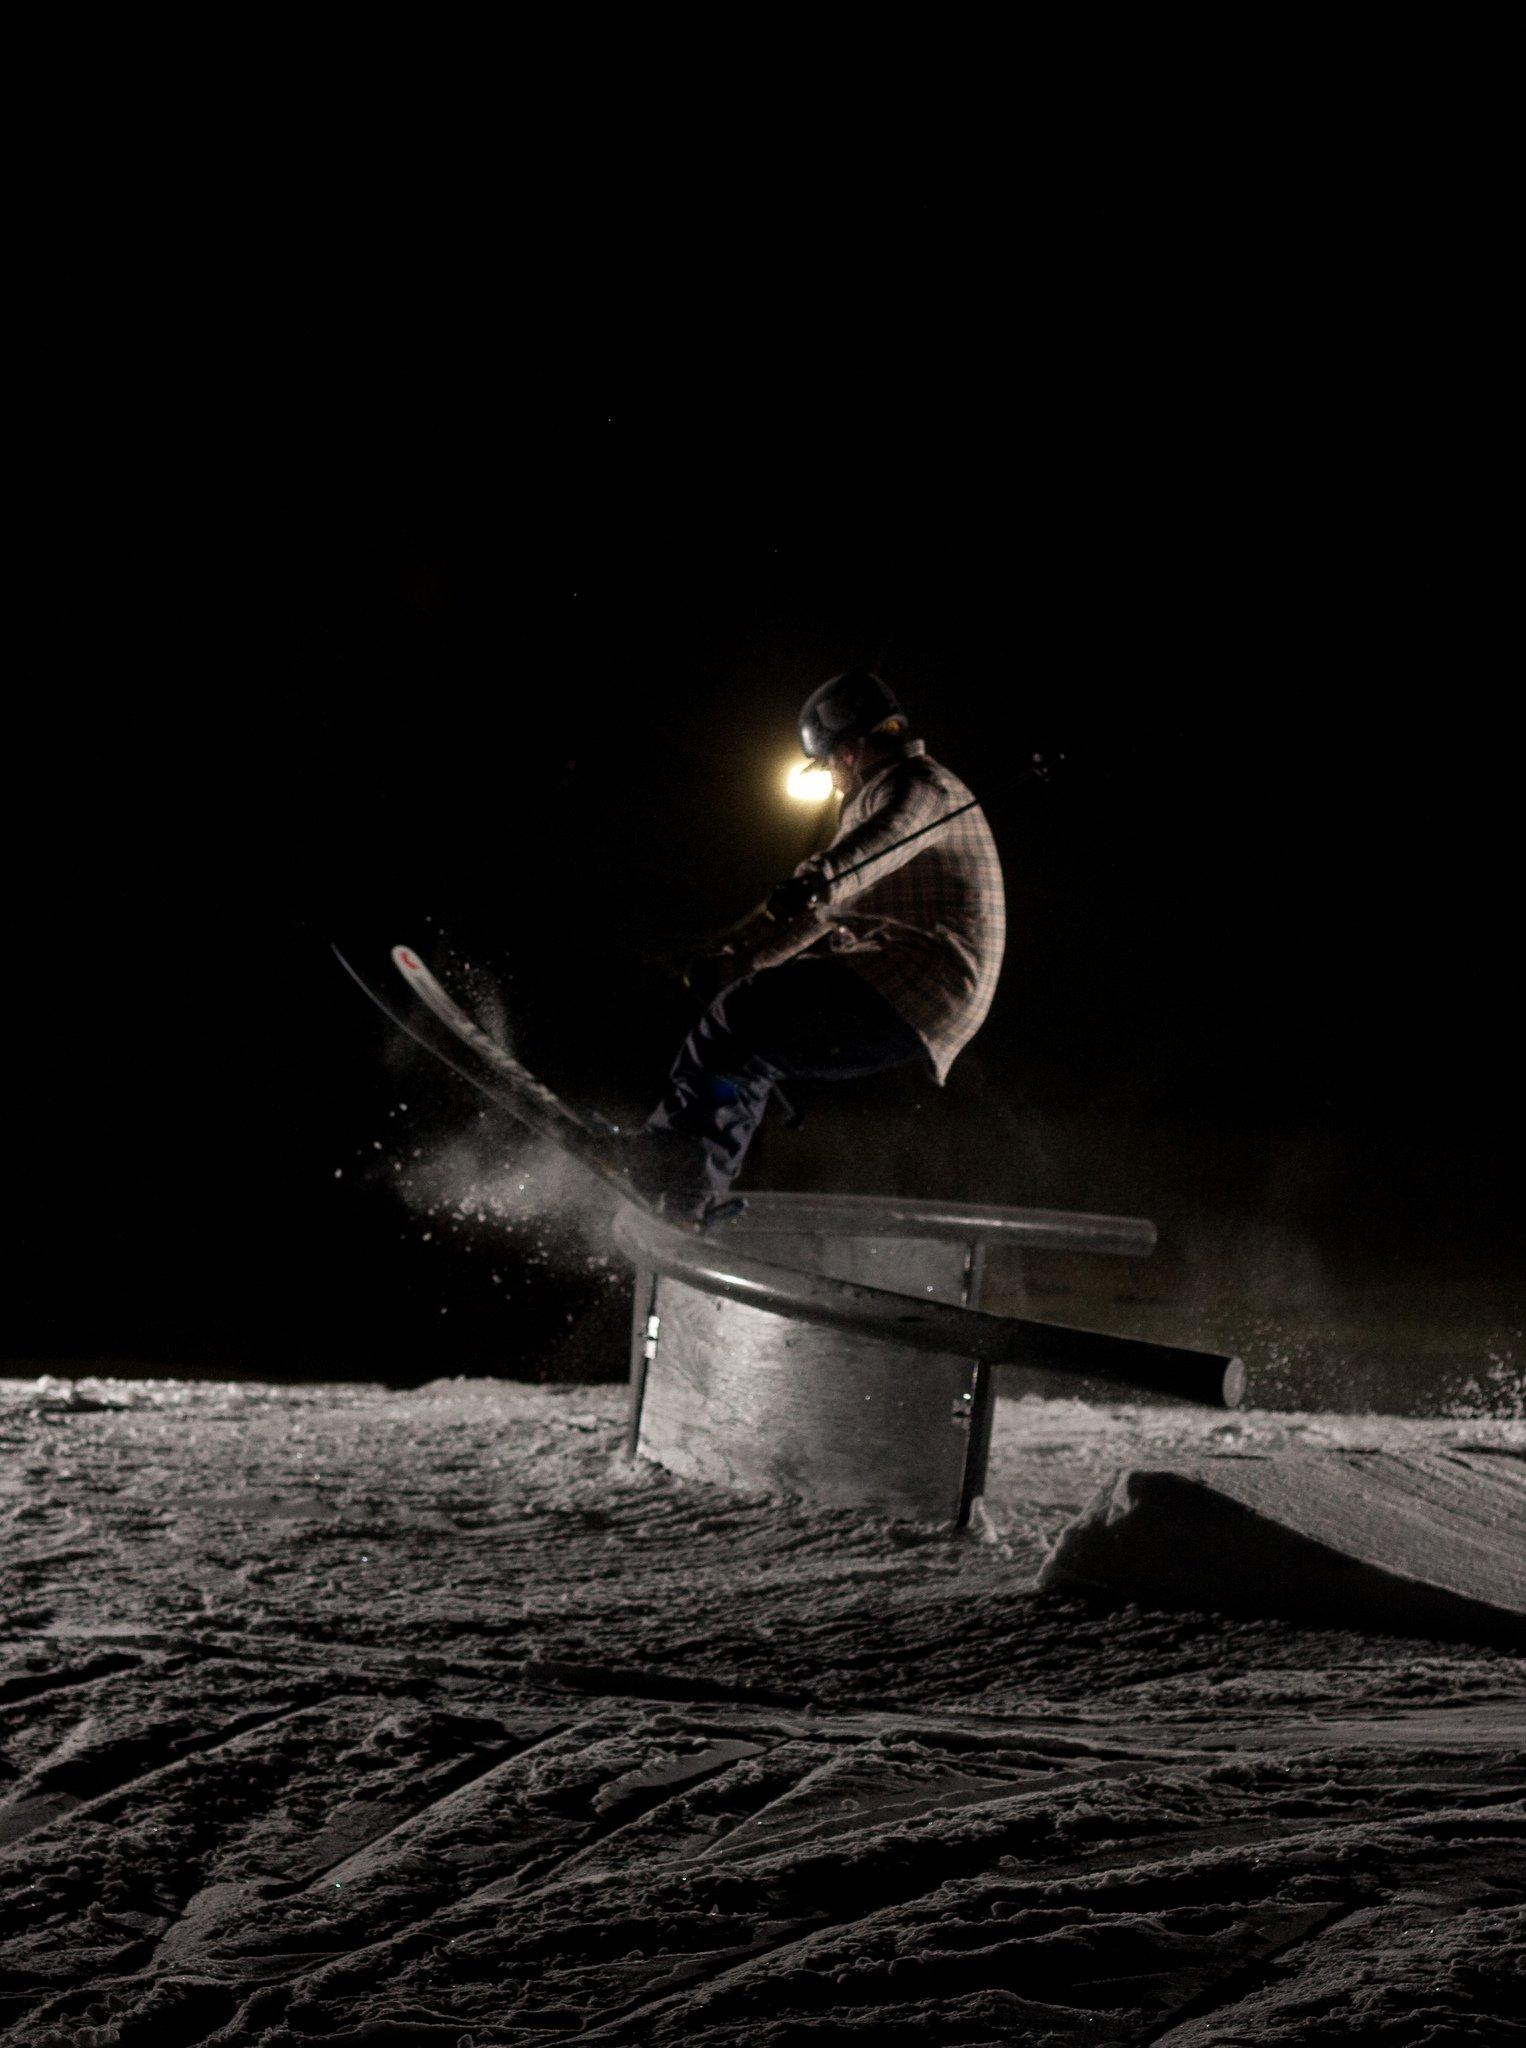 Mike Urich // C-rail